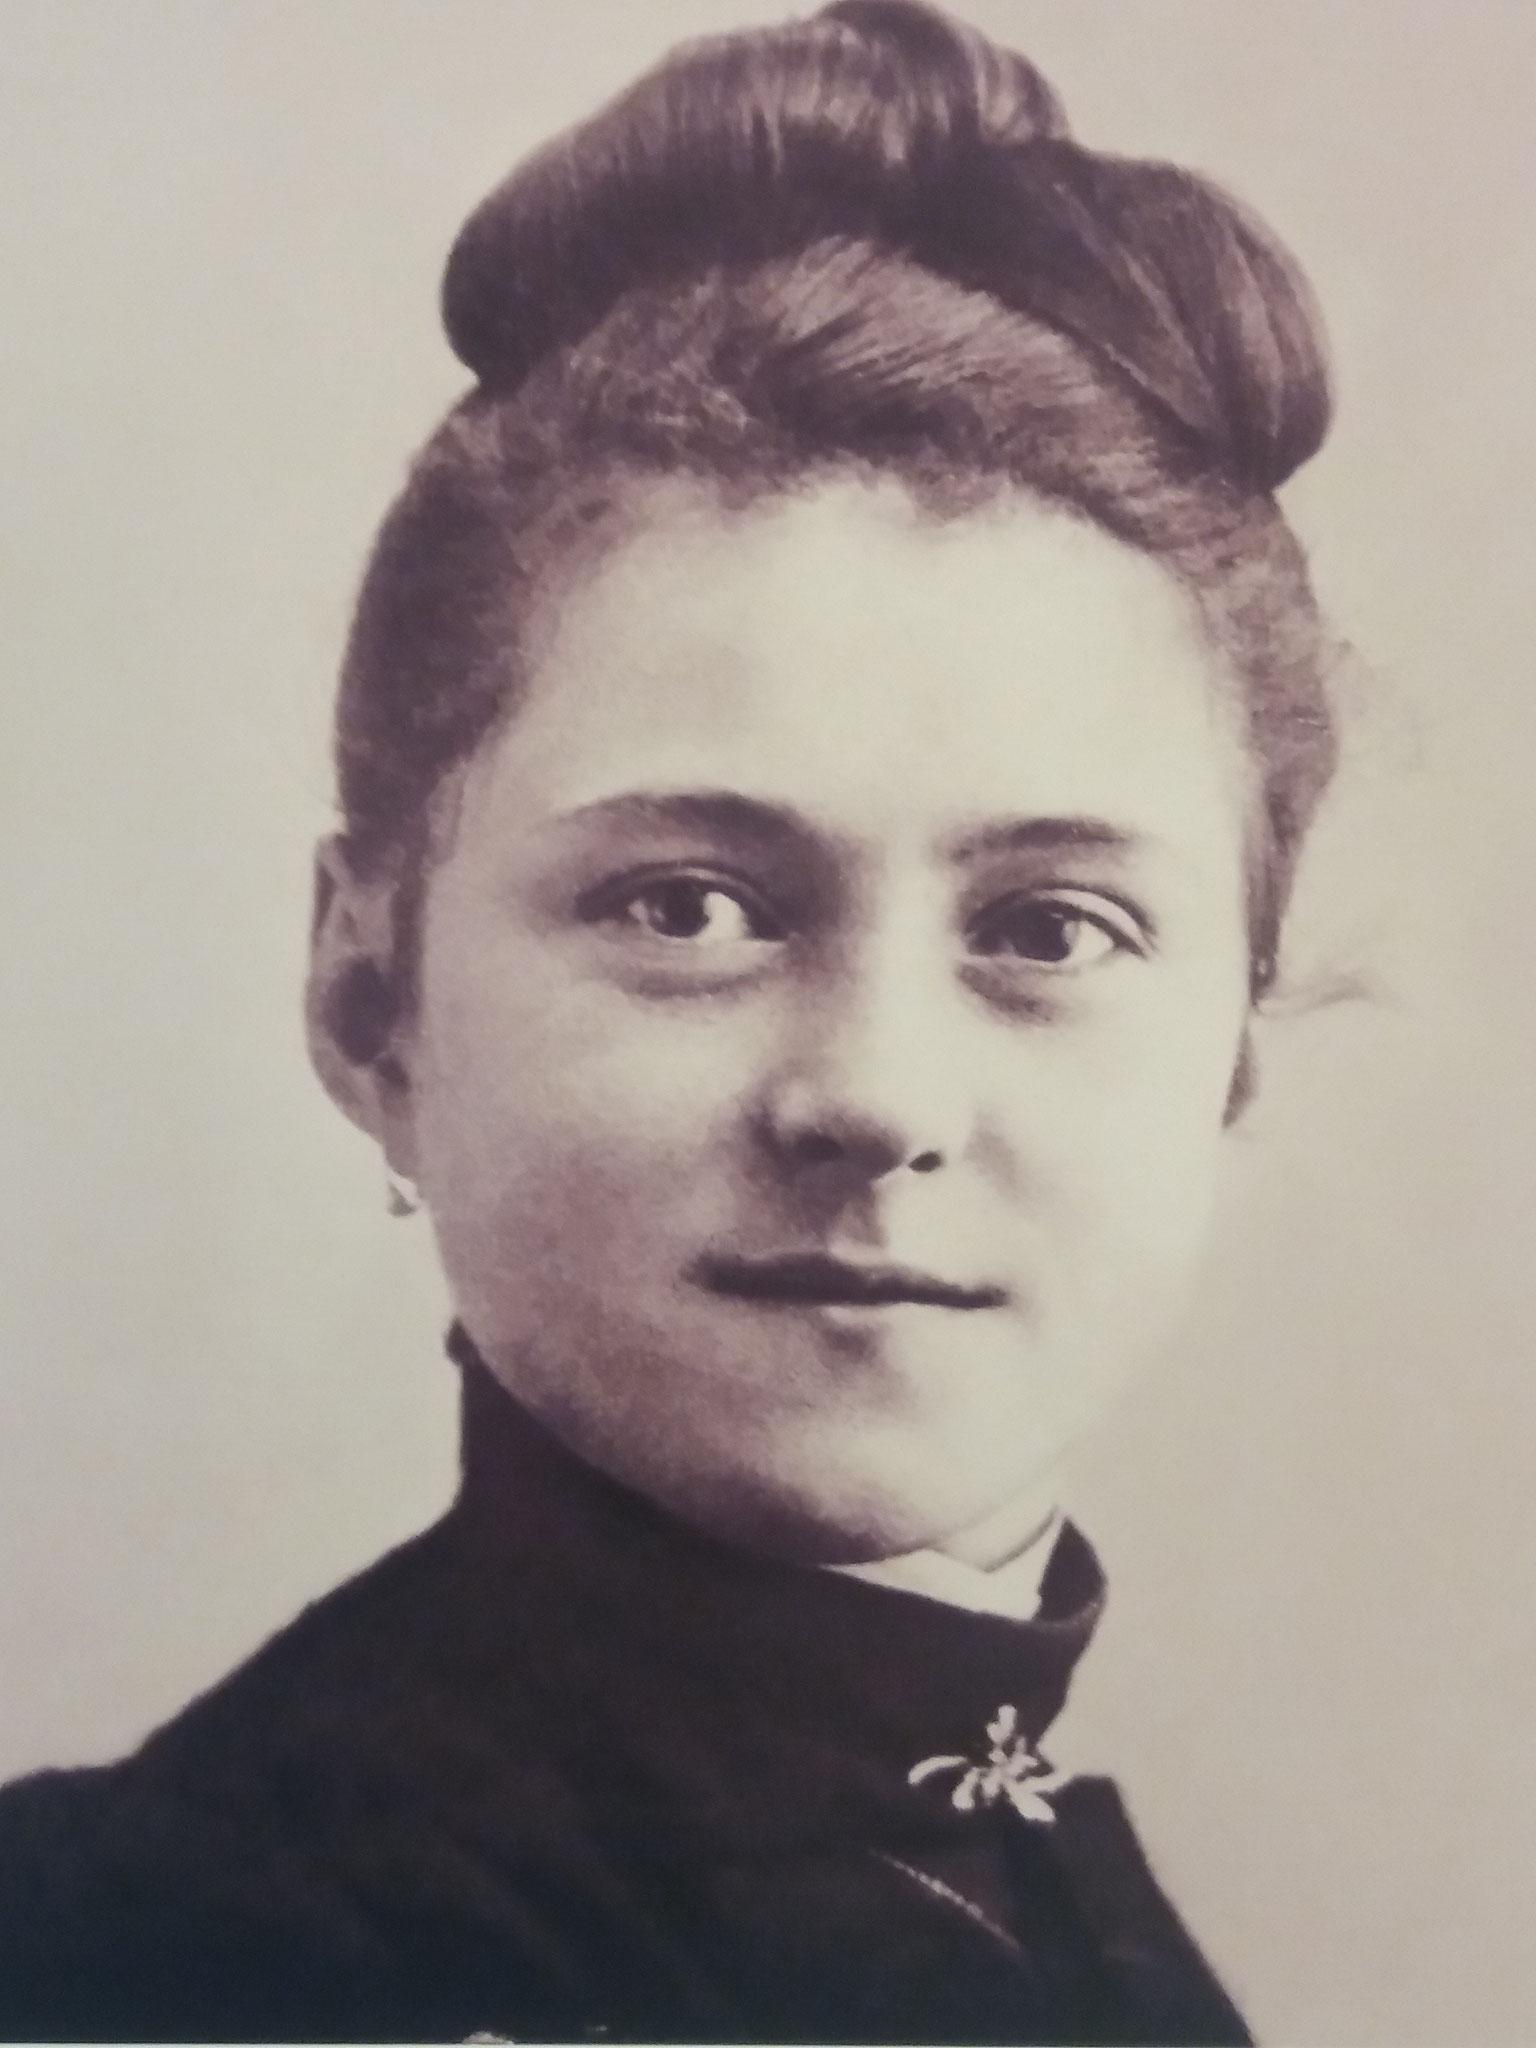 Thérèse jeune fille